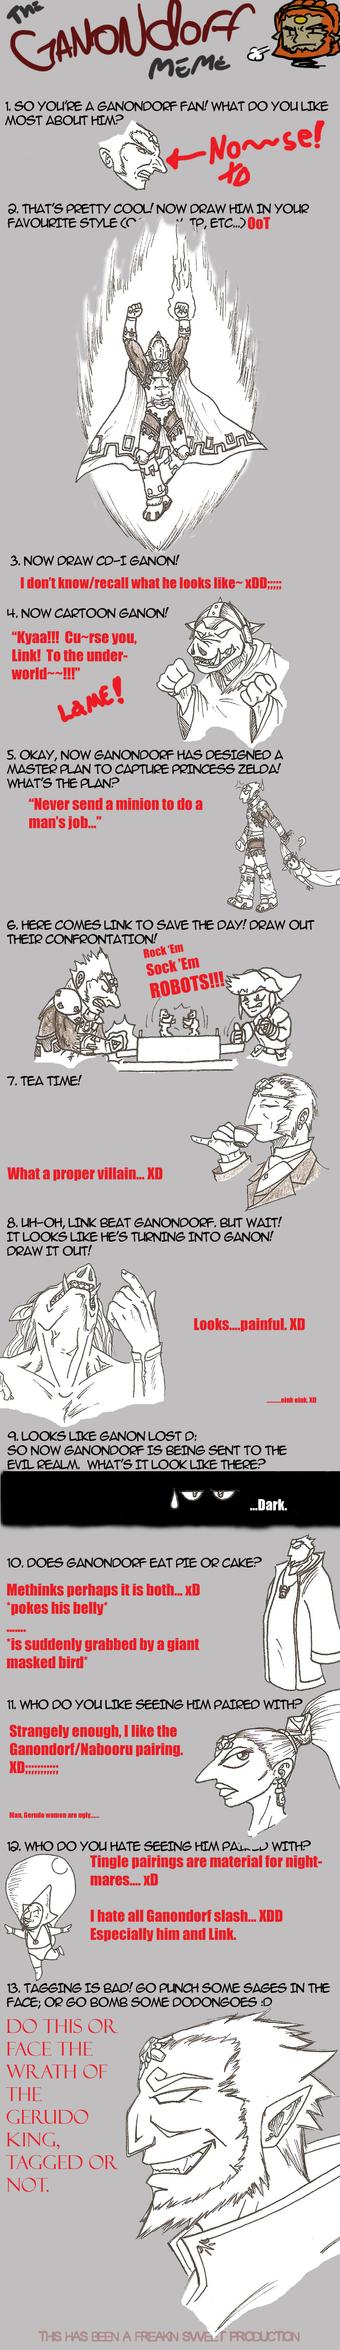 Ganondorf Meme by KaizokuShojo